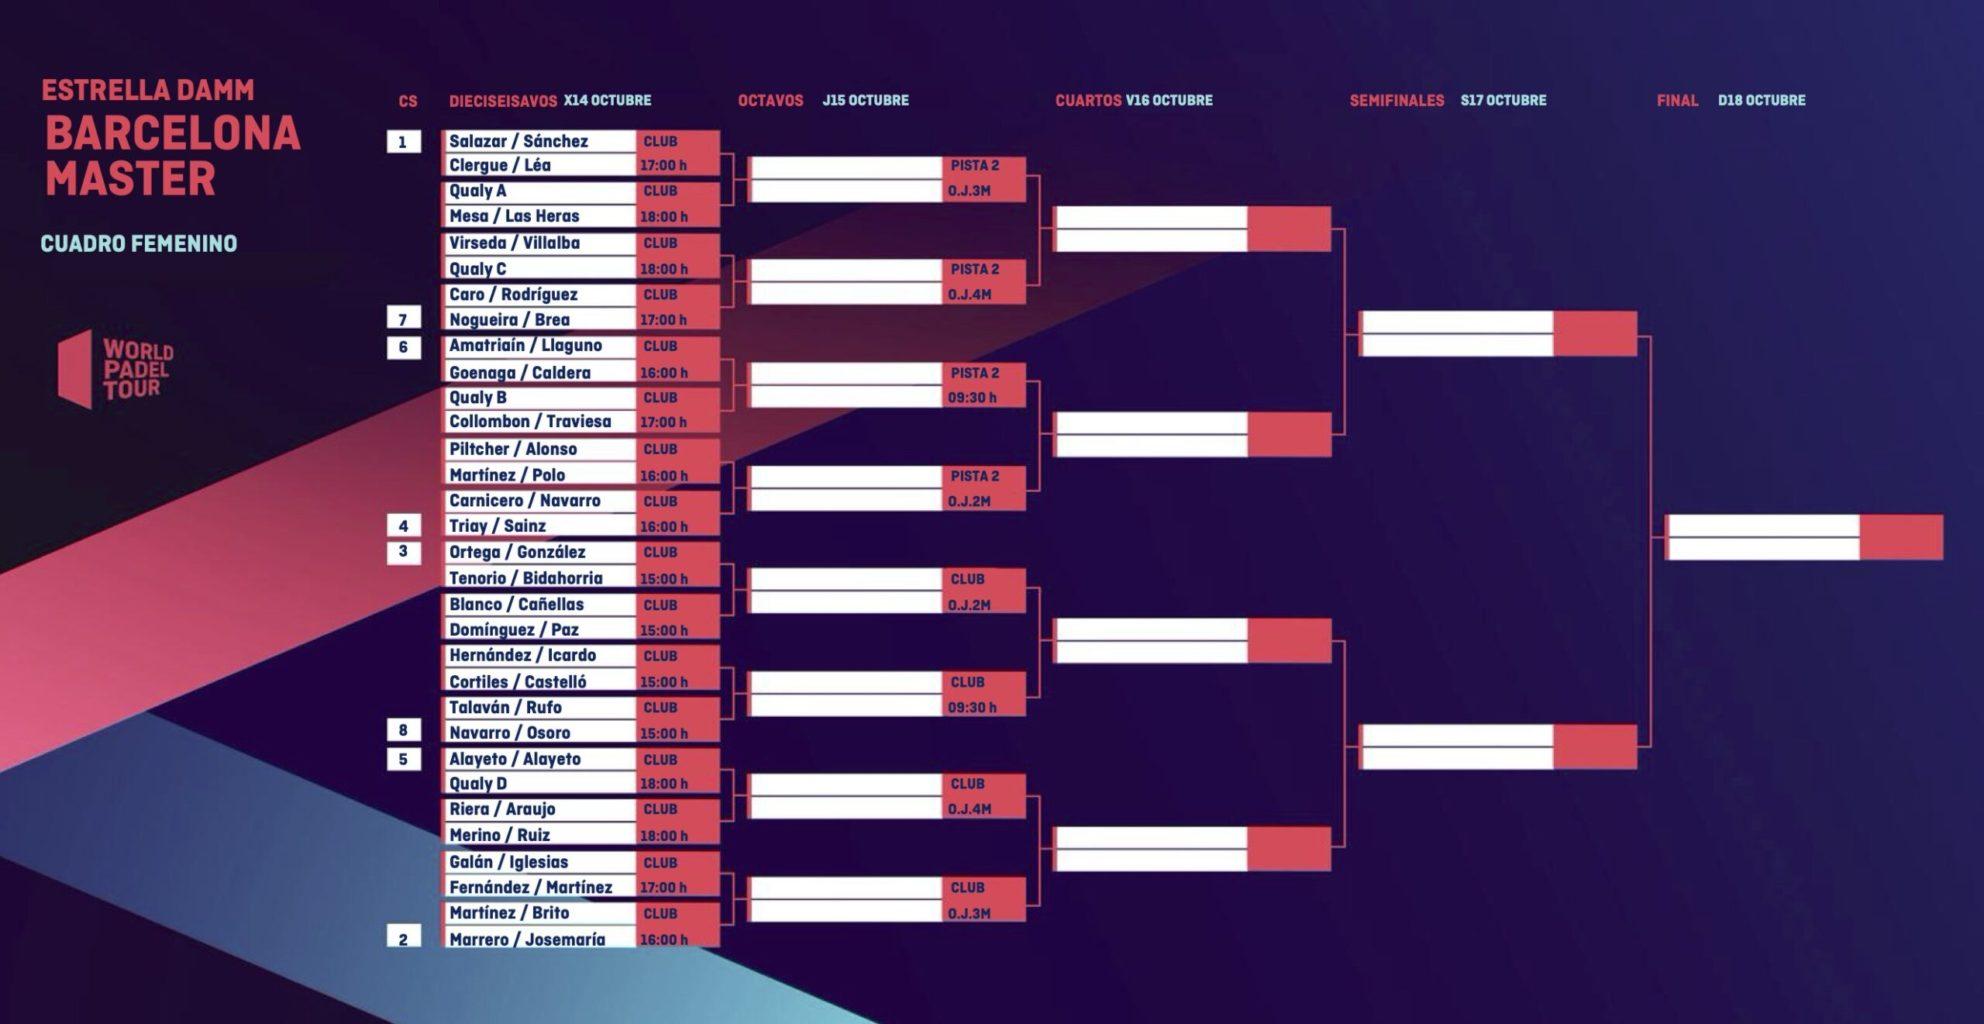 Cuadro final femenino del Estrella Damm Barcelona Master 2020